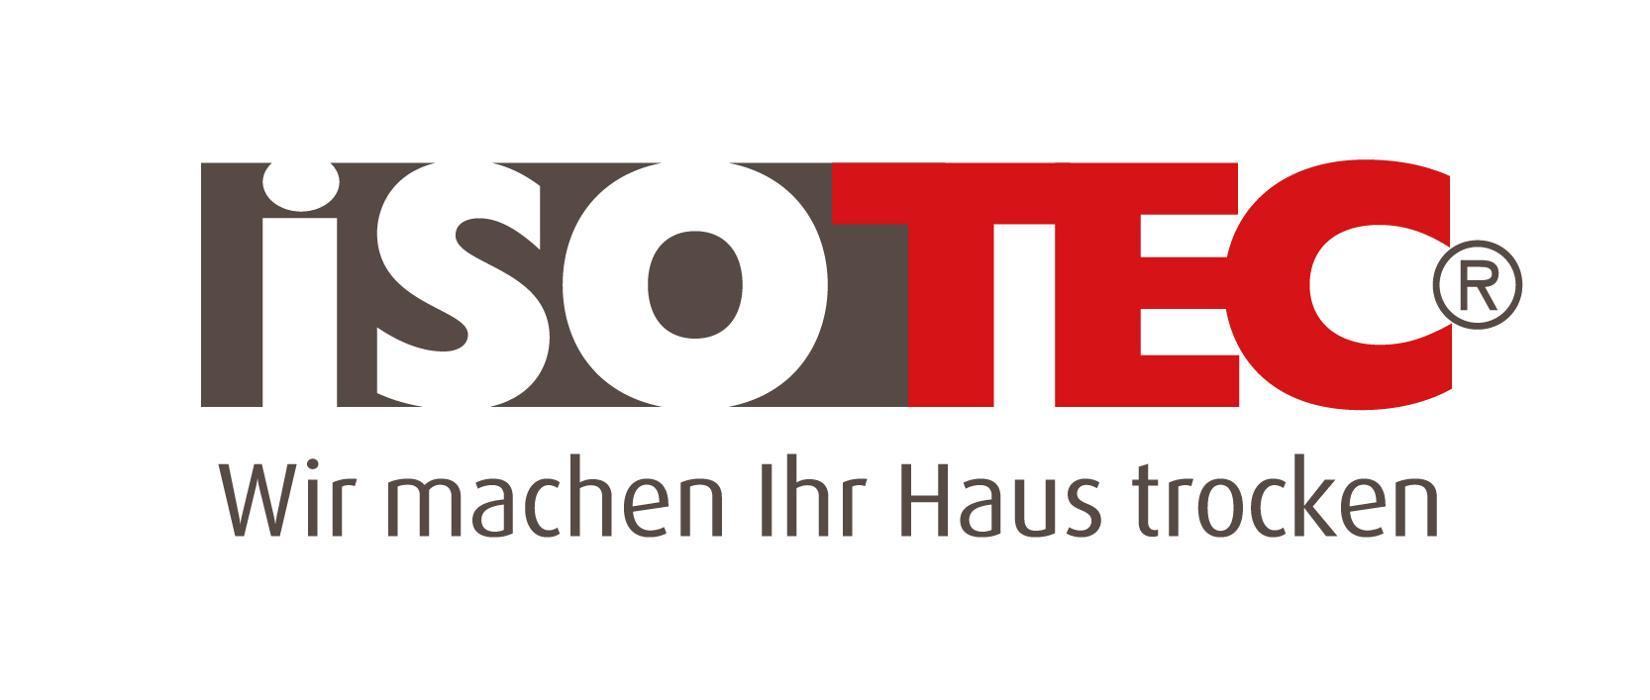 ISOTEC-Fachbetrieb Abdichtungssysteme Andreas Zettel Logo